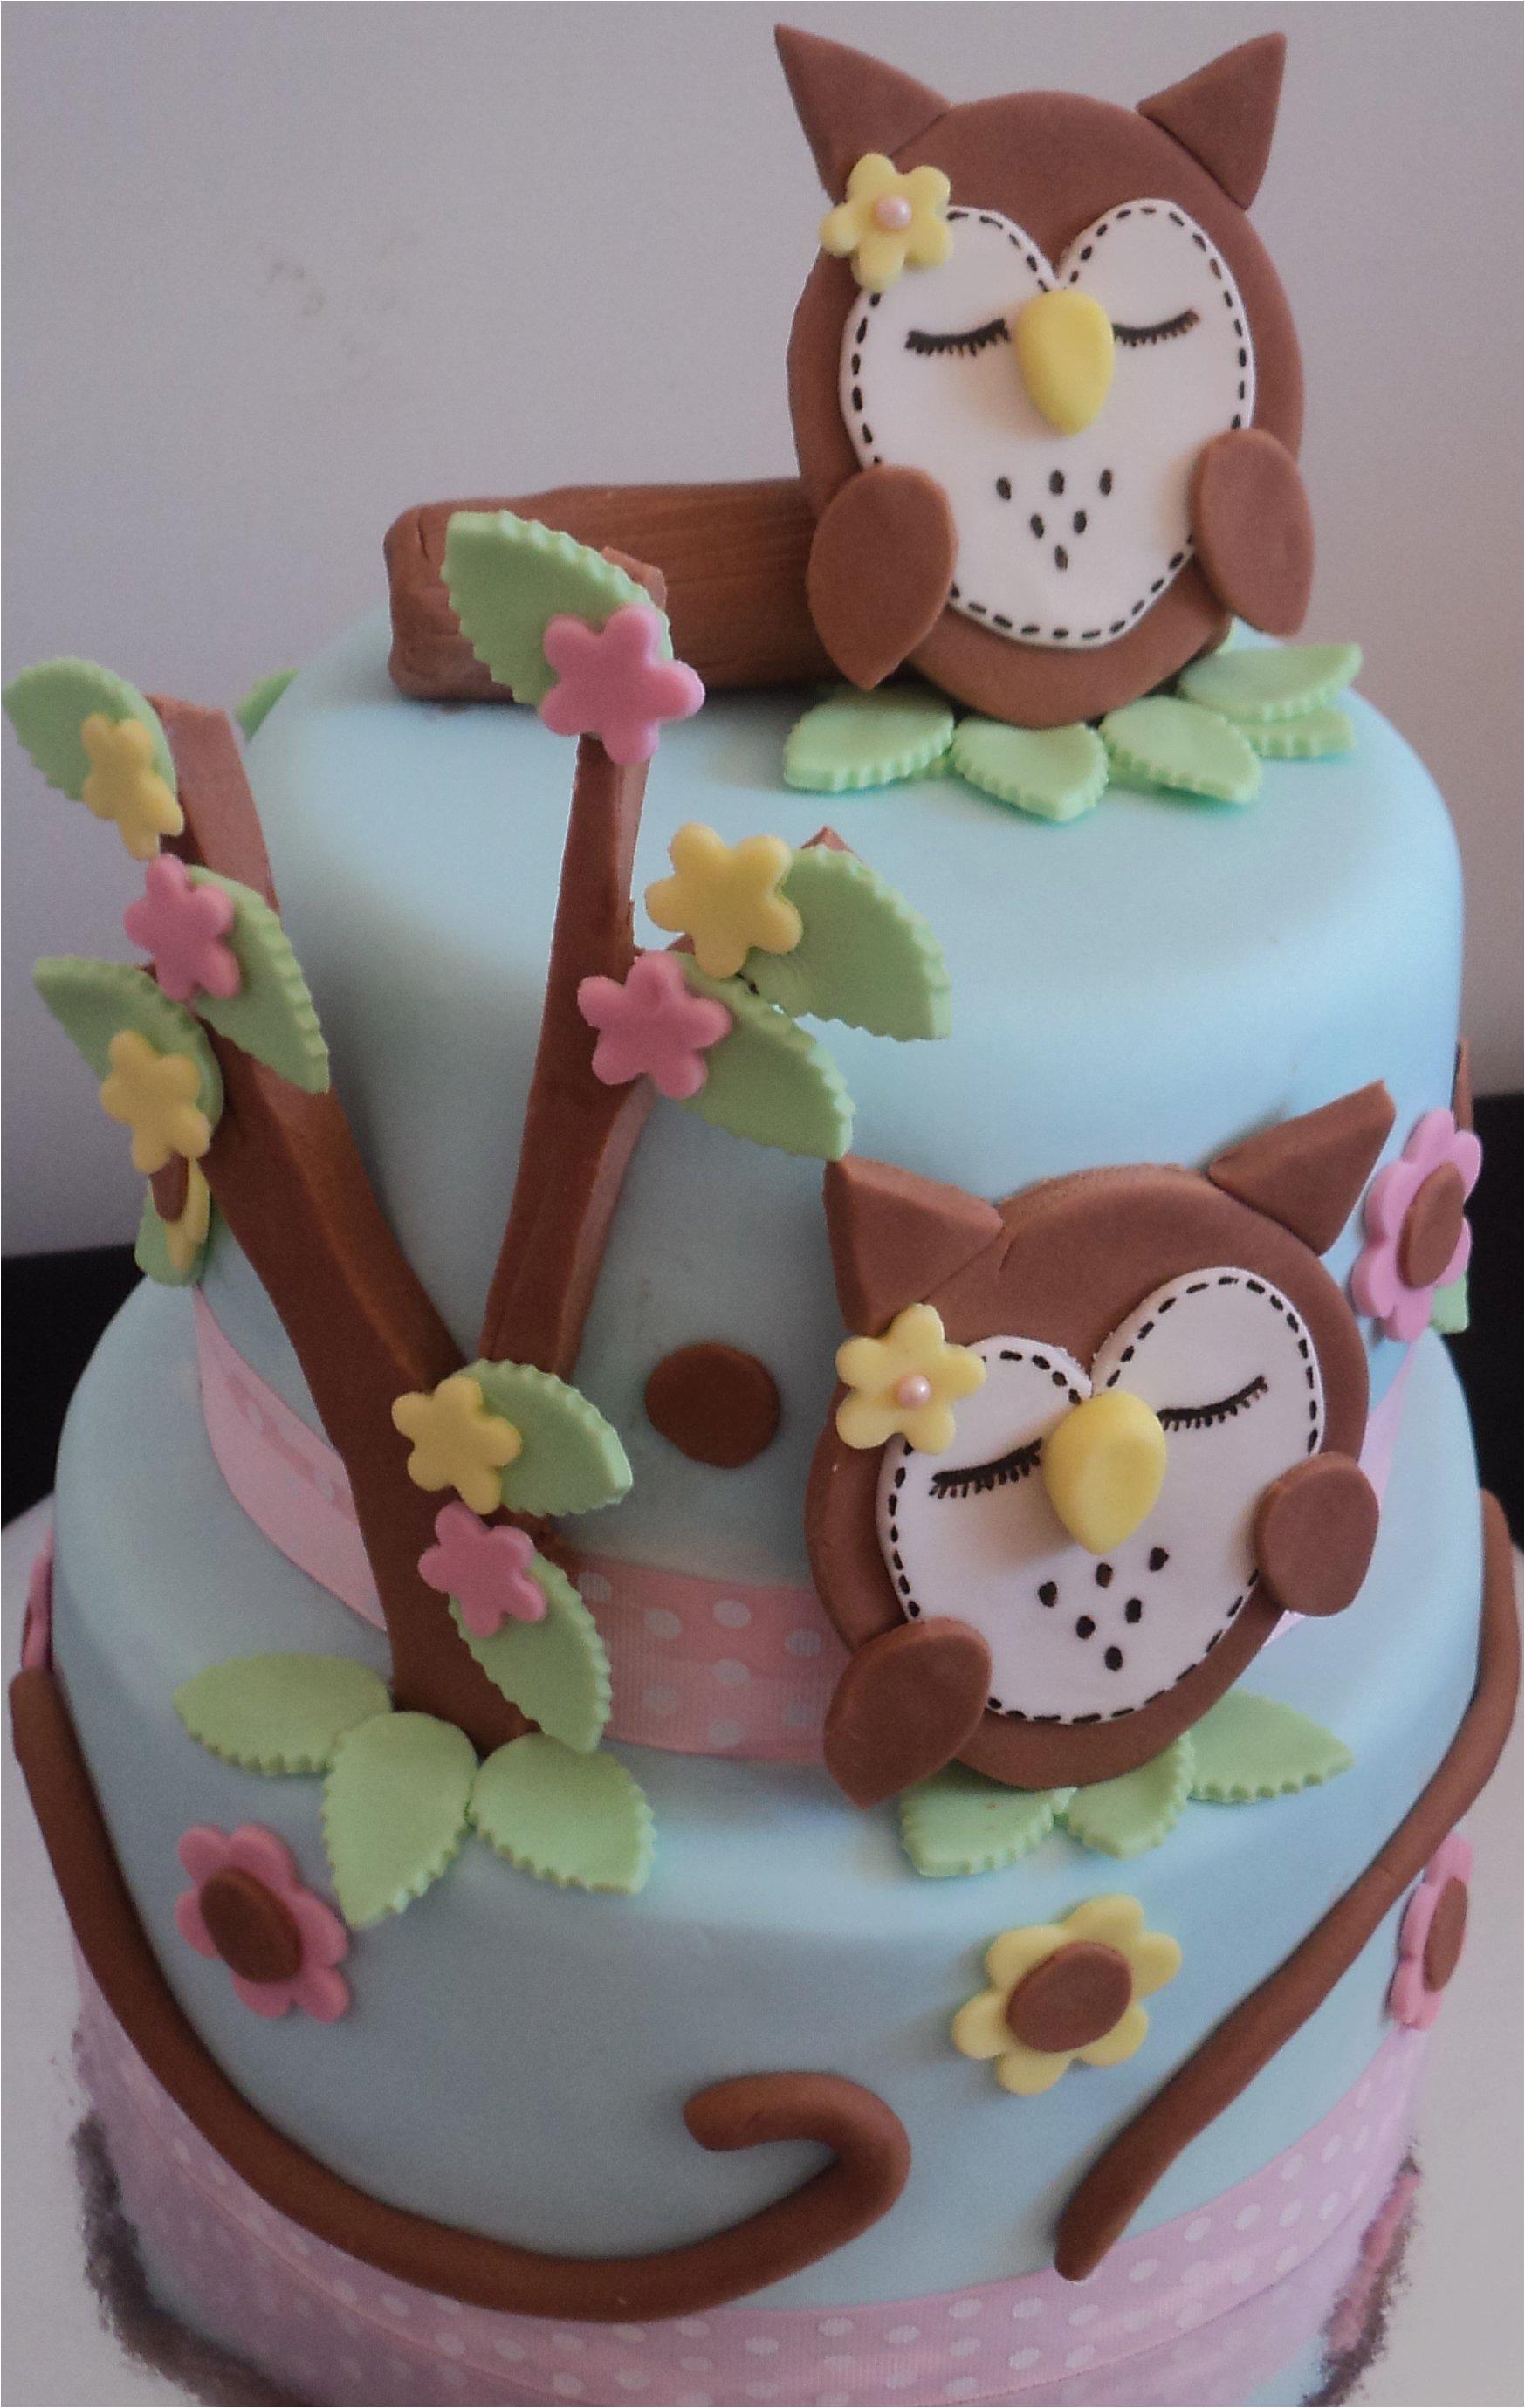 Owl Birthday Cake Decorations Owl Cakes Decoration Ideas Little Birthday Cakes